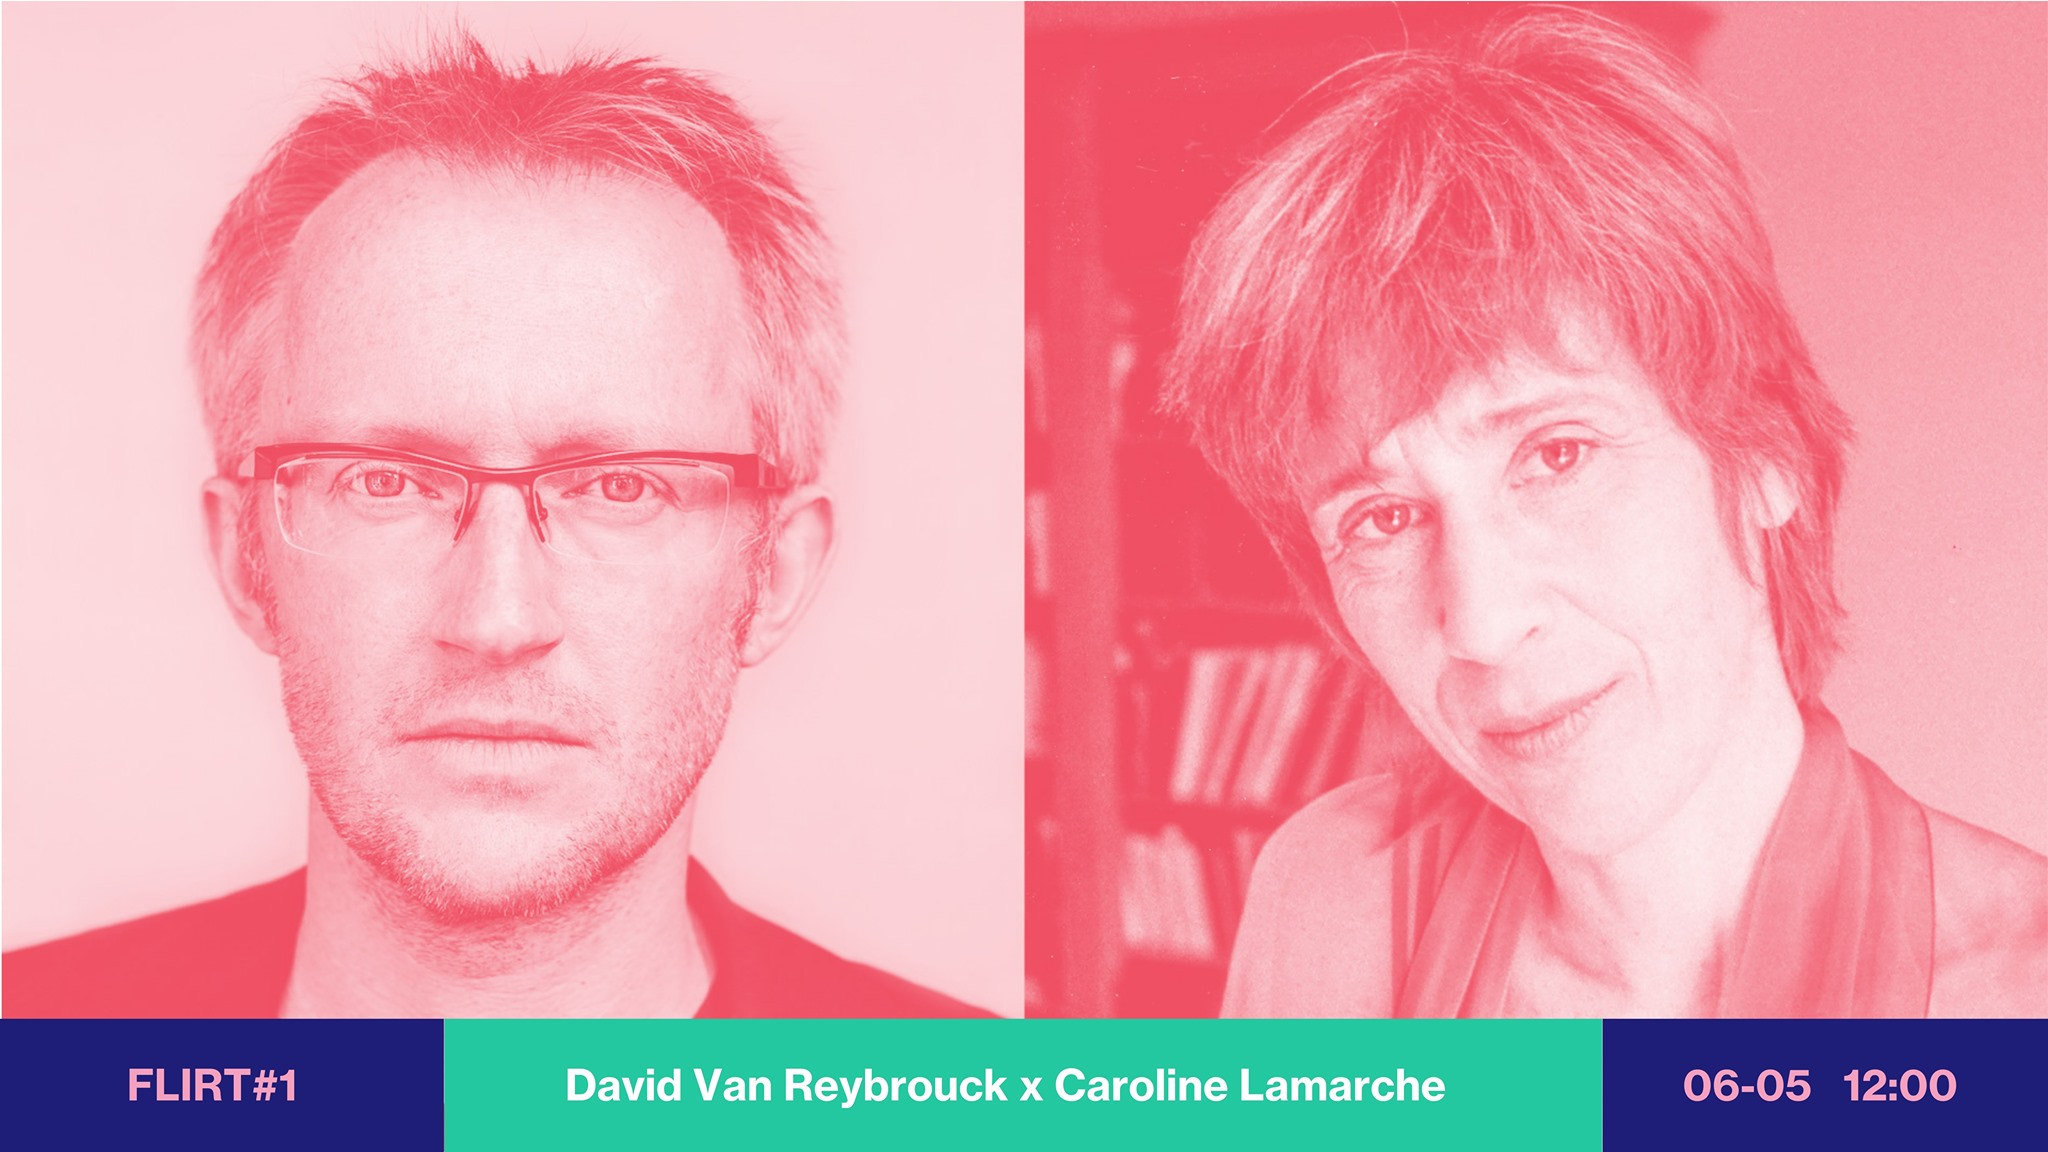 FLIRT #1 David Van Reybrouck & Caroline Lamarche